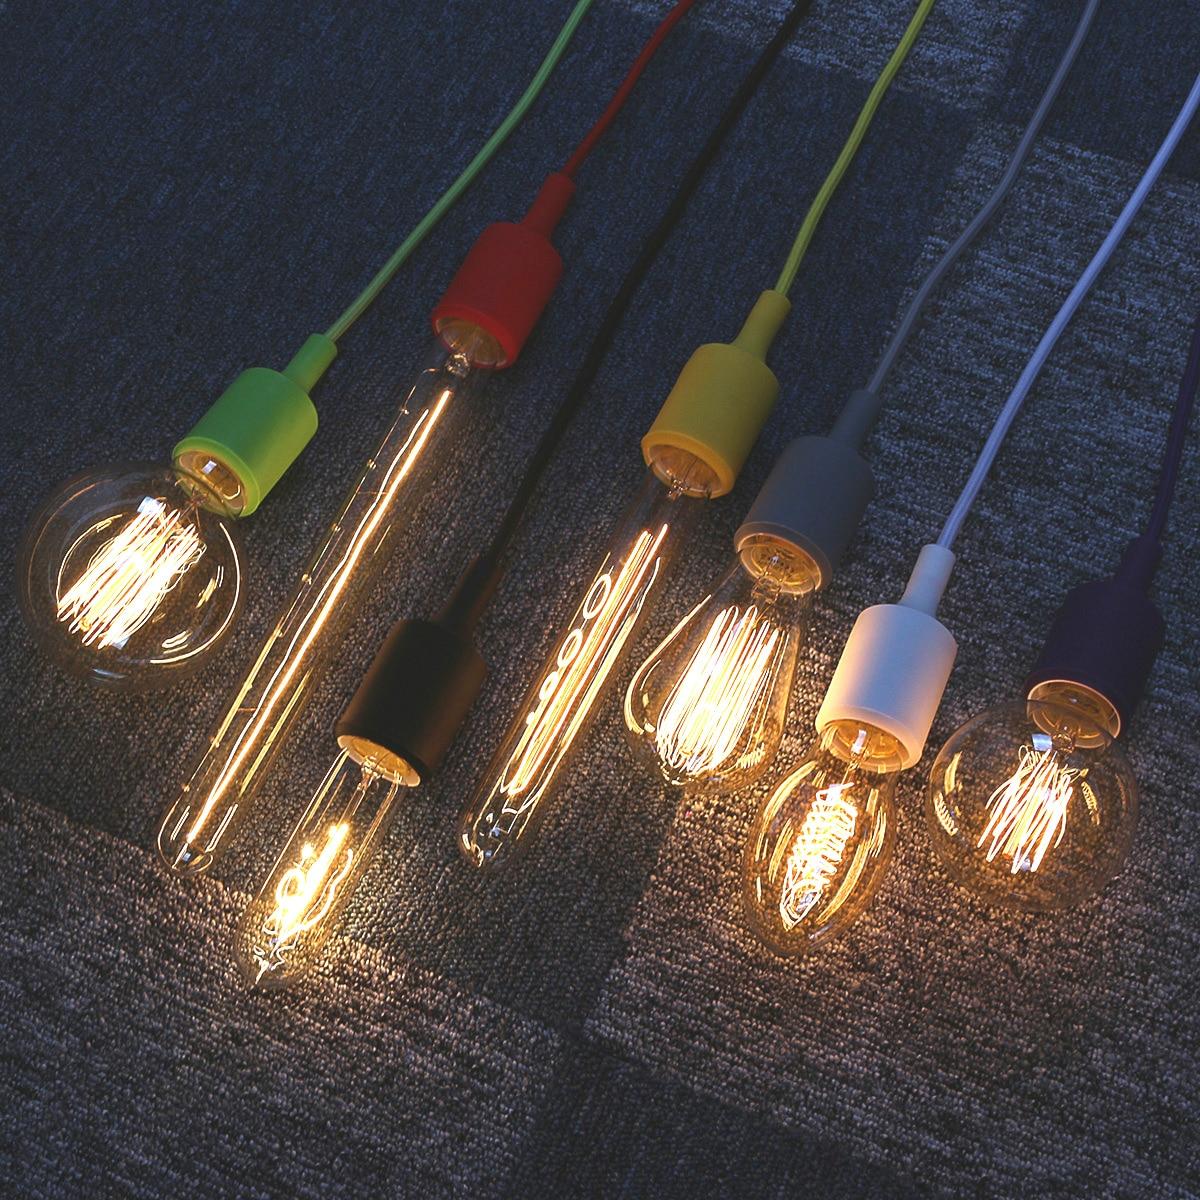 E27 40w Vintage Retro Filament Edison Tungsten Light Bulb: Aliexpress.com : Buy E27 40W LED Bulbs Filament Light